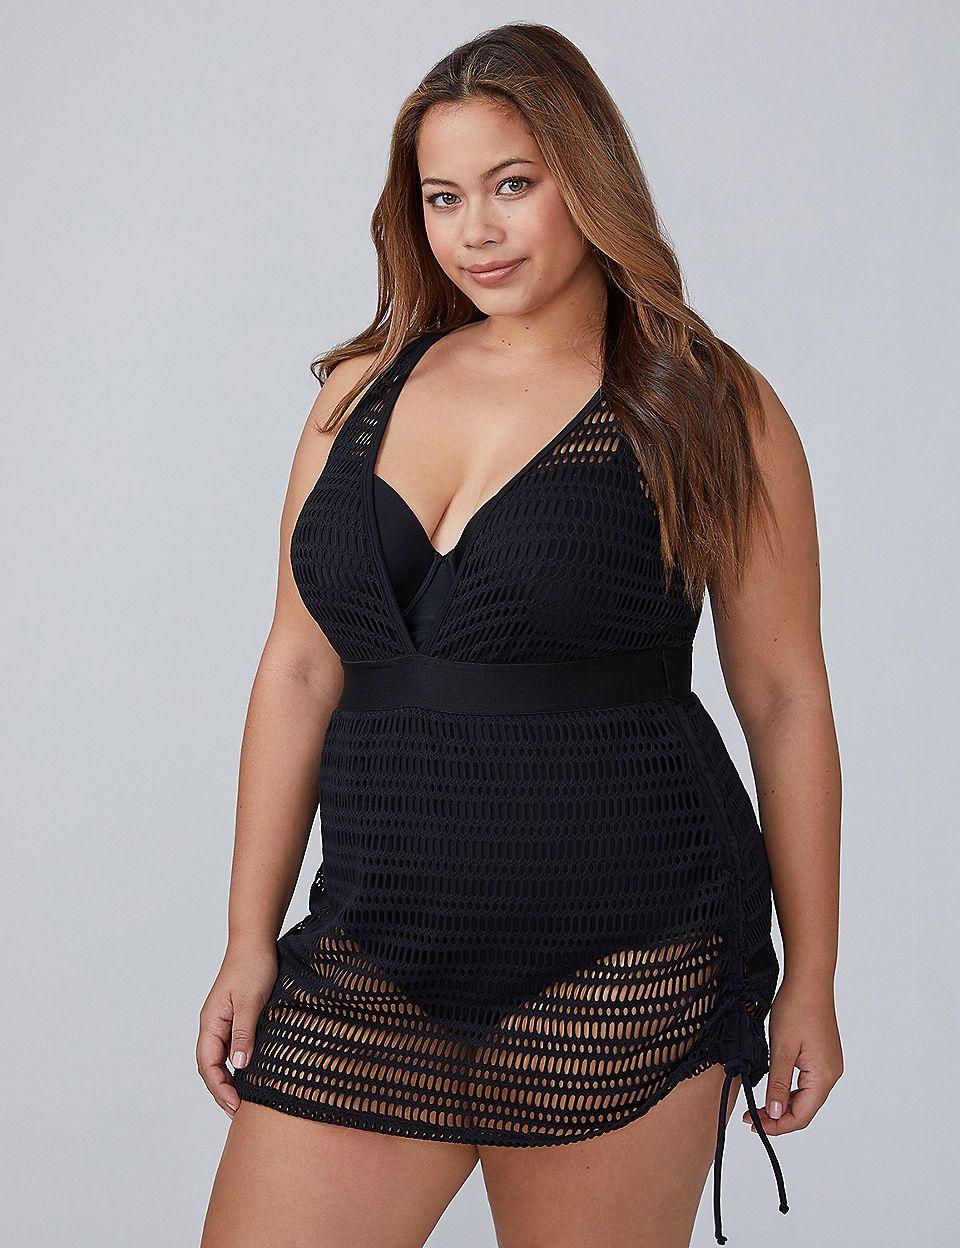 580a246699 Crochet Mesh One-Piece Swim Dress with Built-In Balconette Bra ...